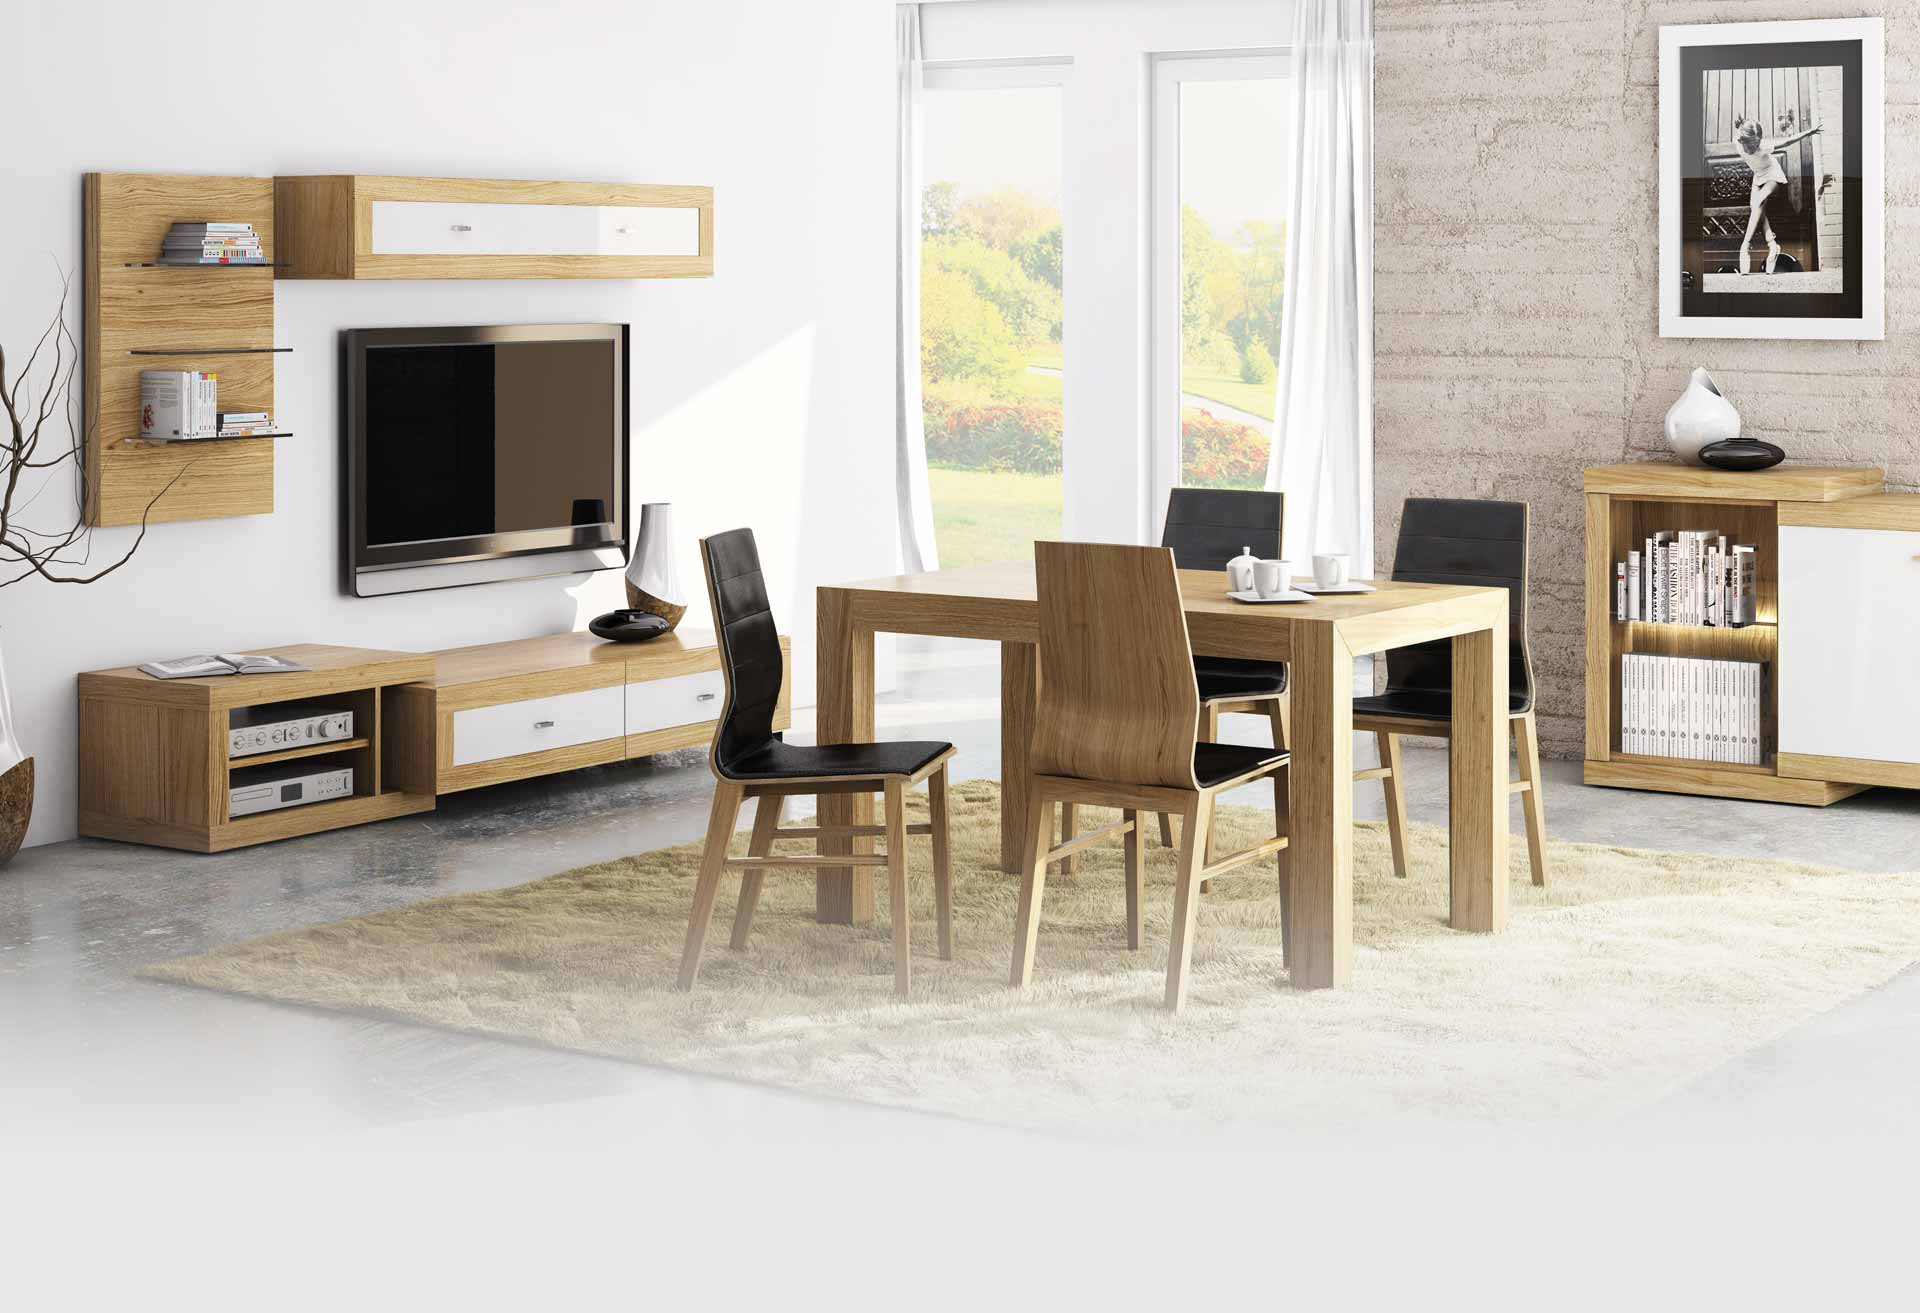 10e799764 Drevené masívne stoly, jedálenské stoly na mieru, drevený stôl z masívu